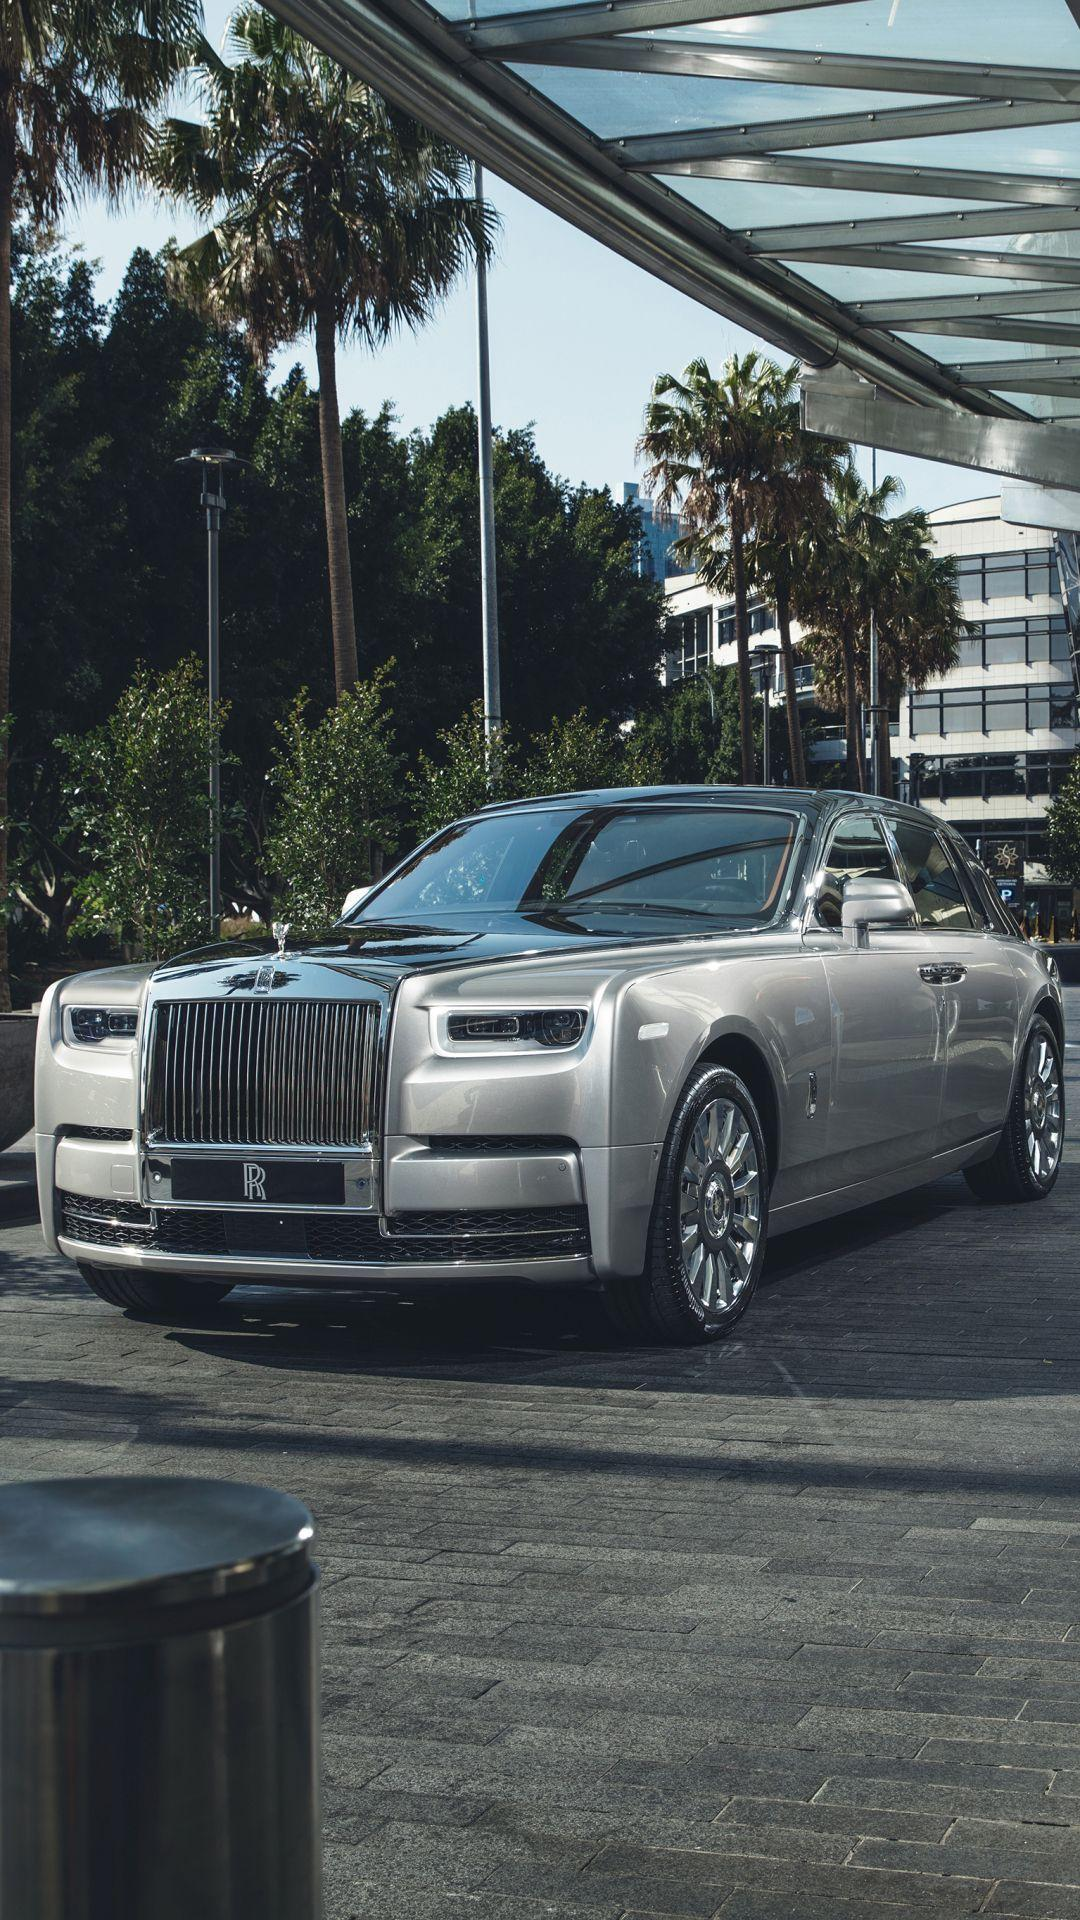 Rolls Royce Car 4k Iphone 2020 Wallpapers Wallpaper Cave